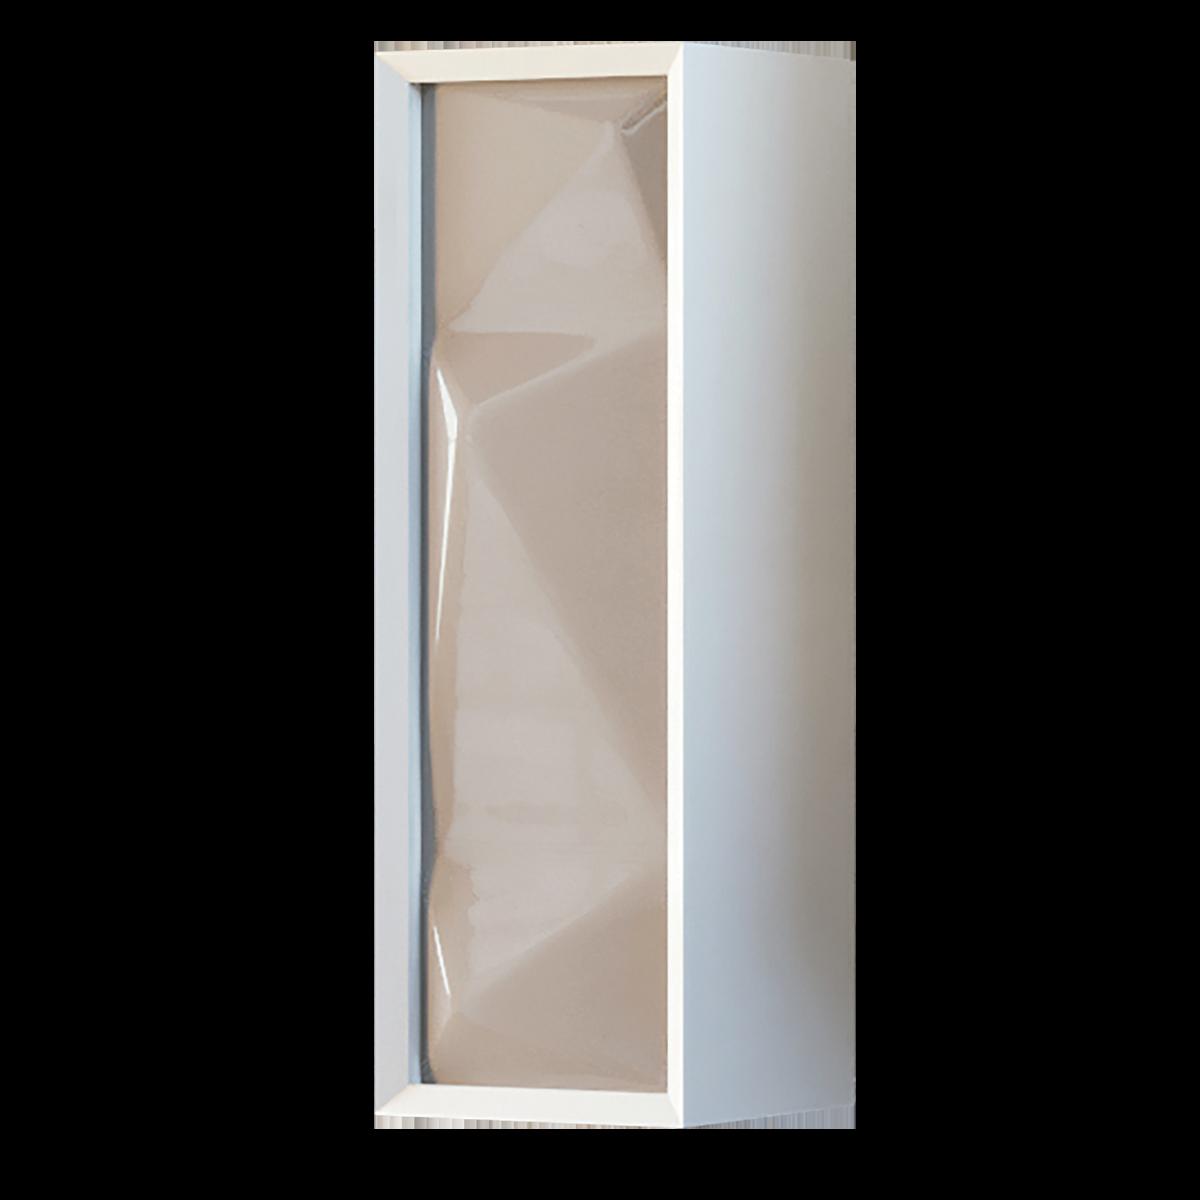 Пенал Romb 30П 1д. Cappuccino L - купить в Чебоксарах по цене 12 770 Р в интернет-магазине Marka